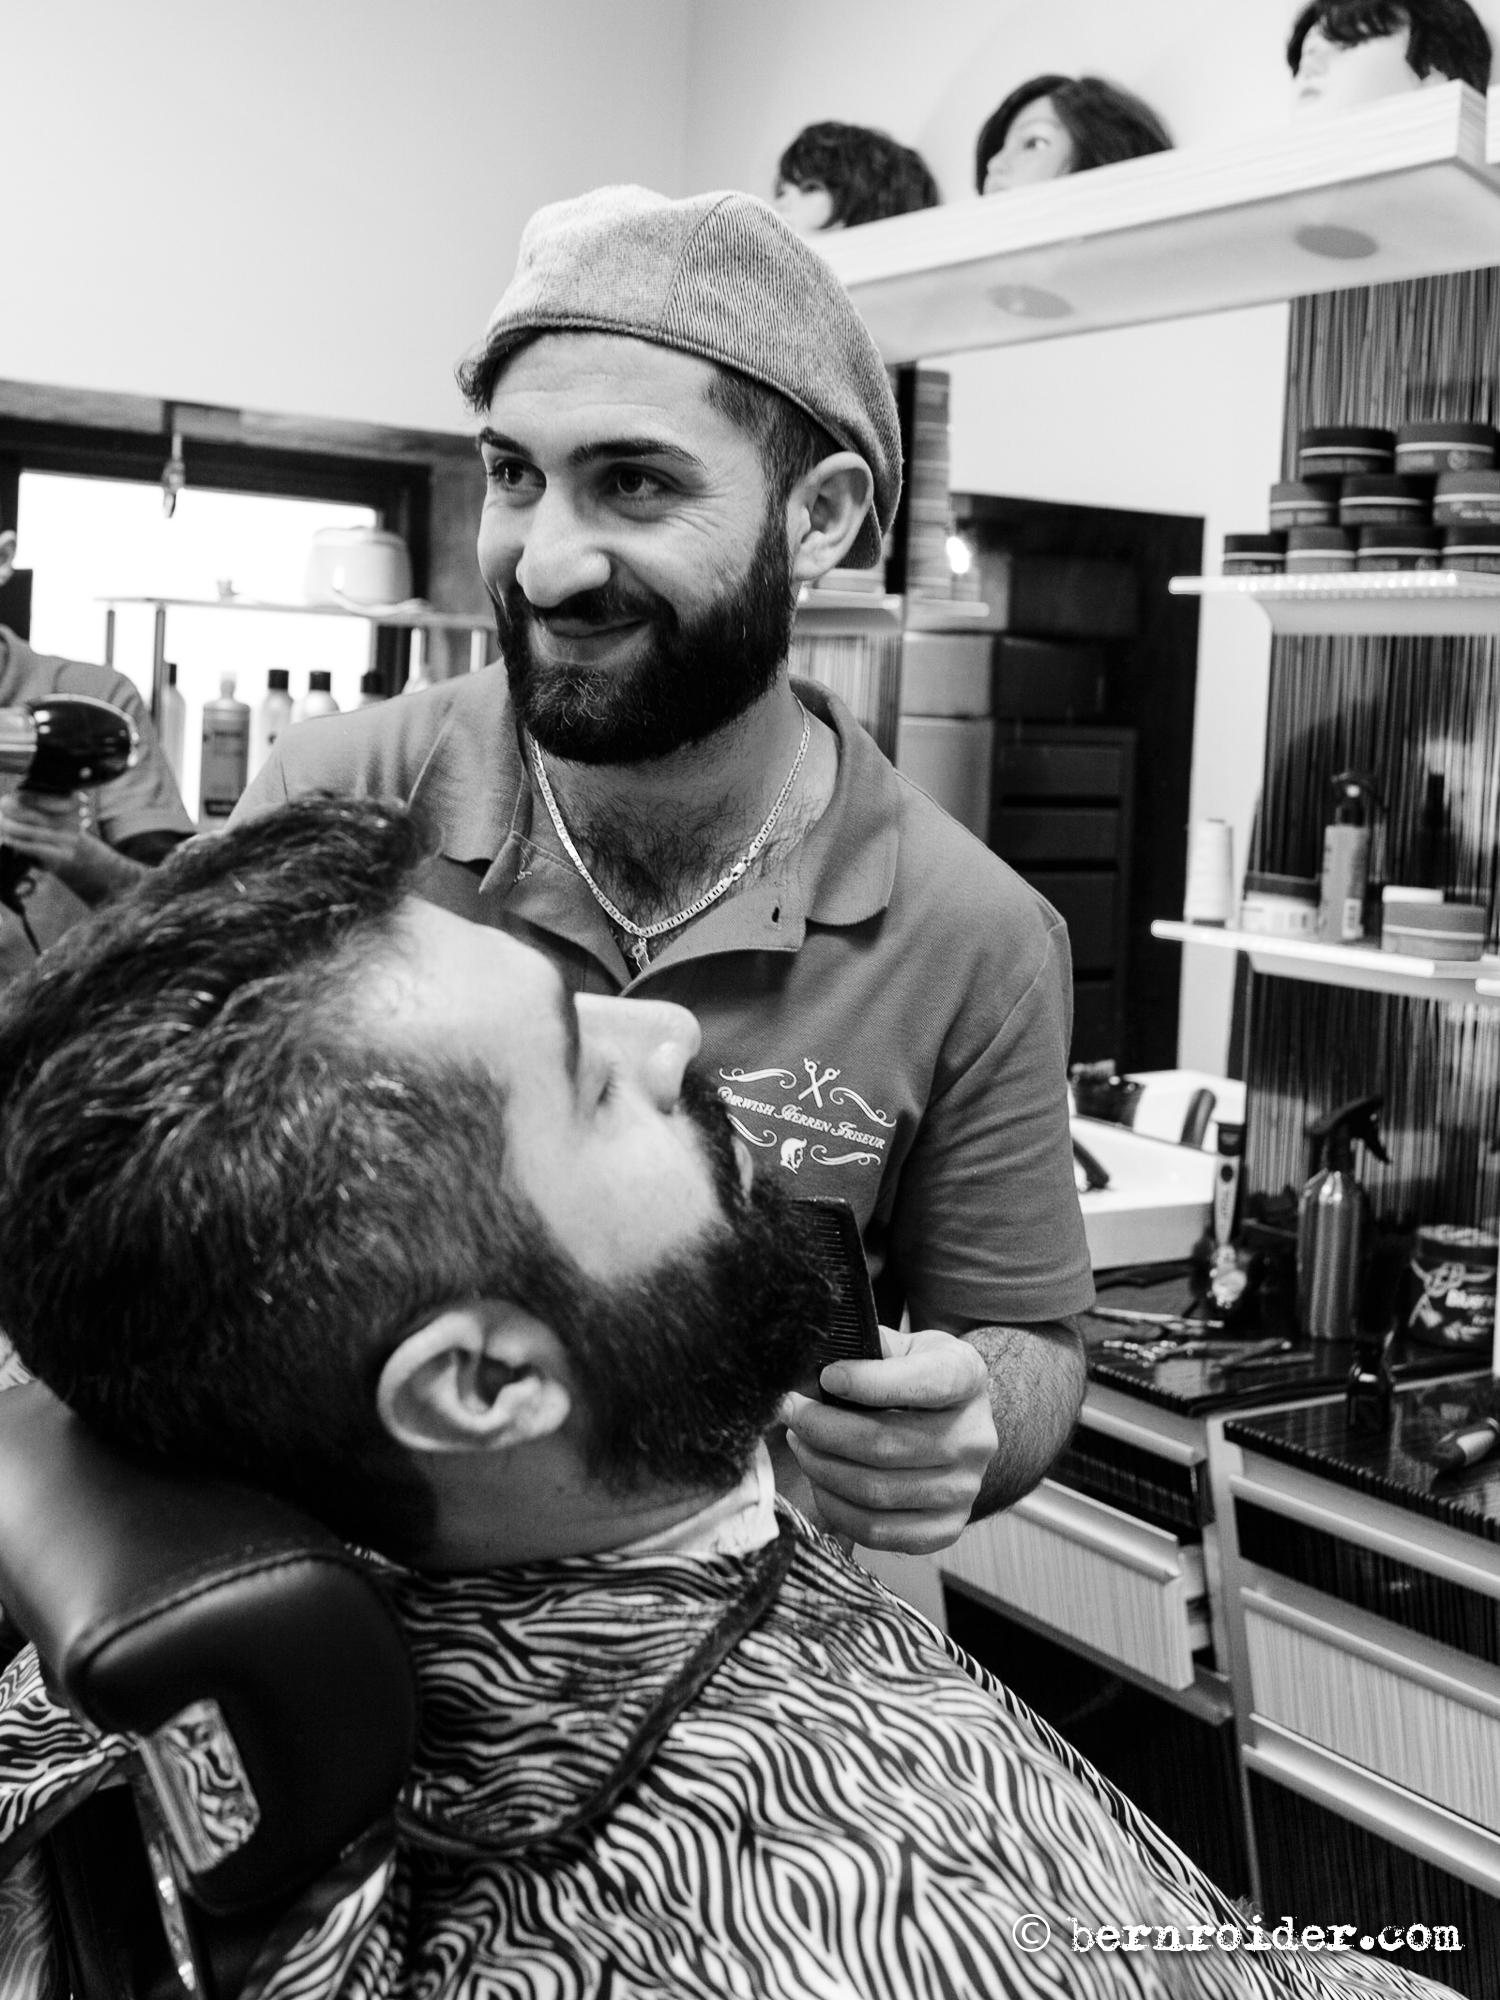 Darwish Barber Shop